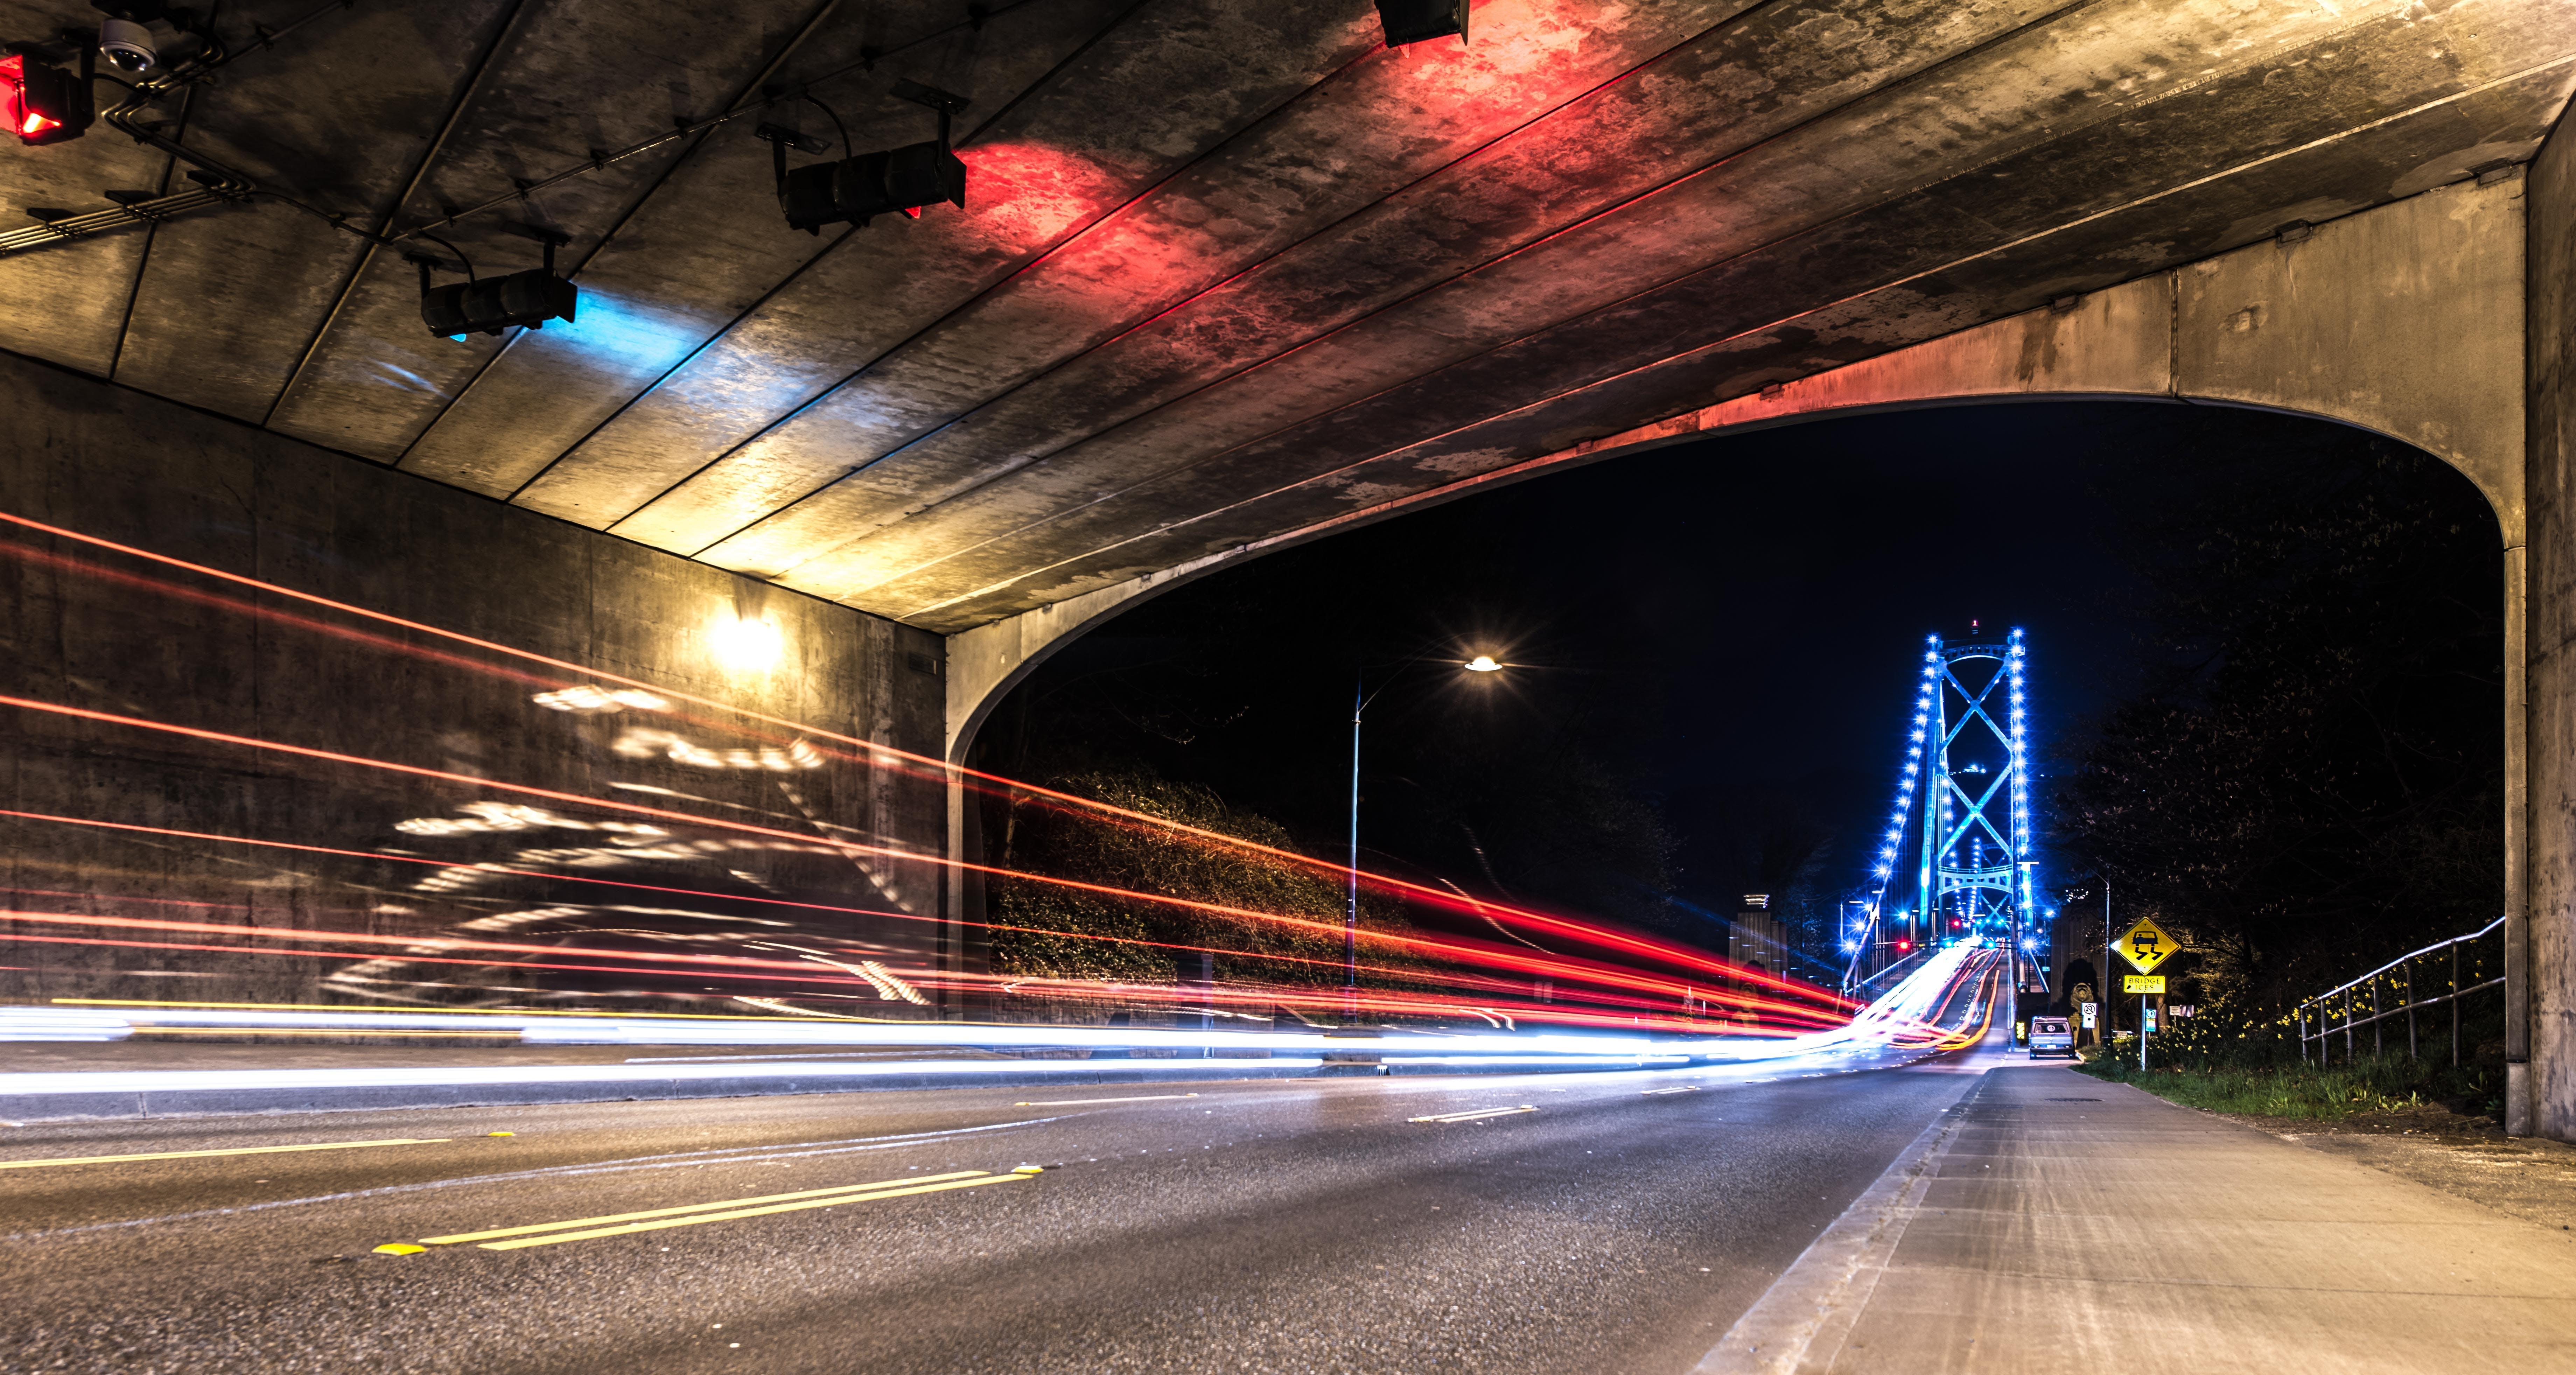 Long Exposure Photography of Vehicle Lights and Bridge